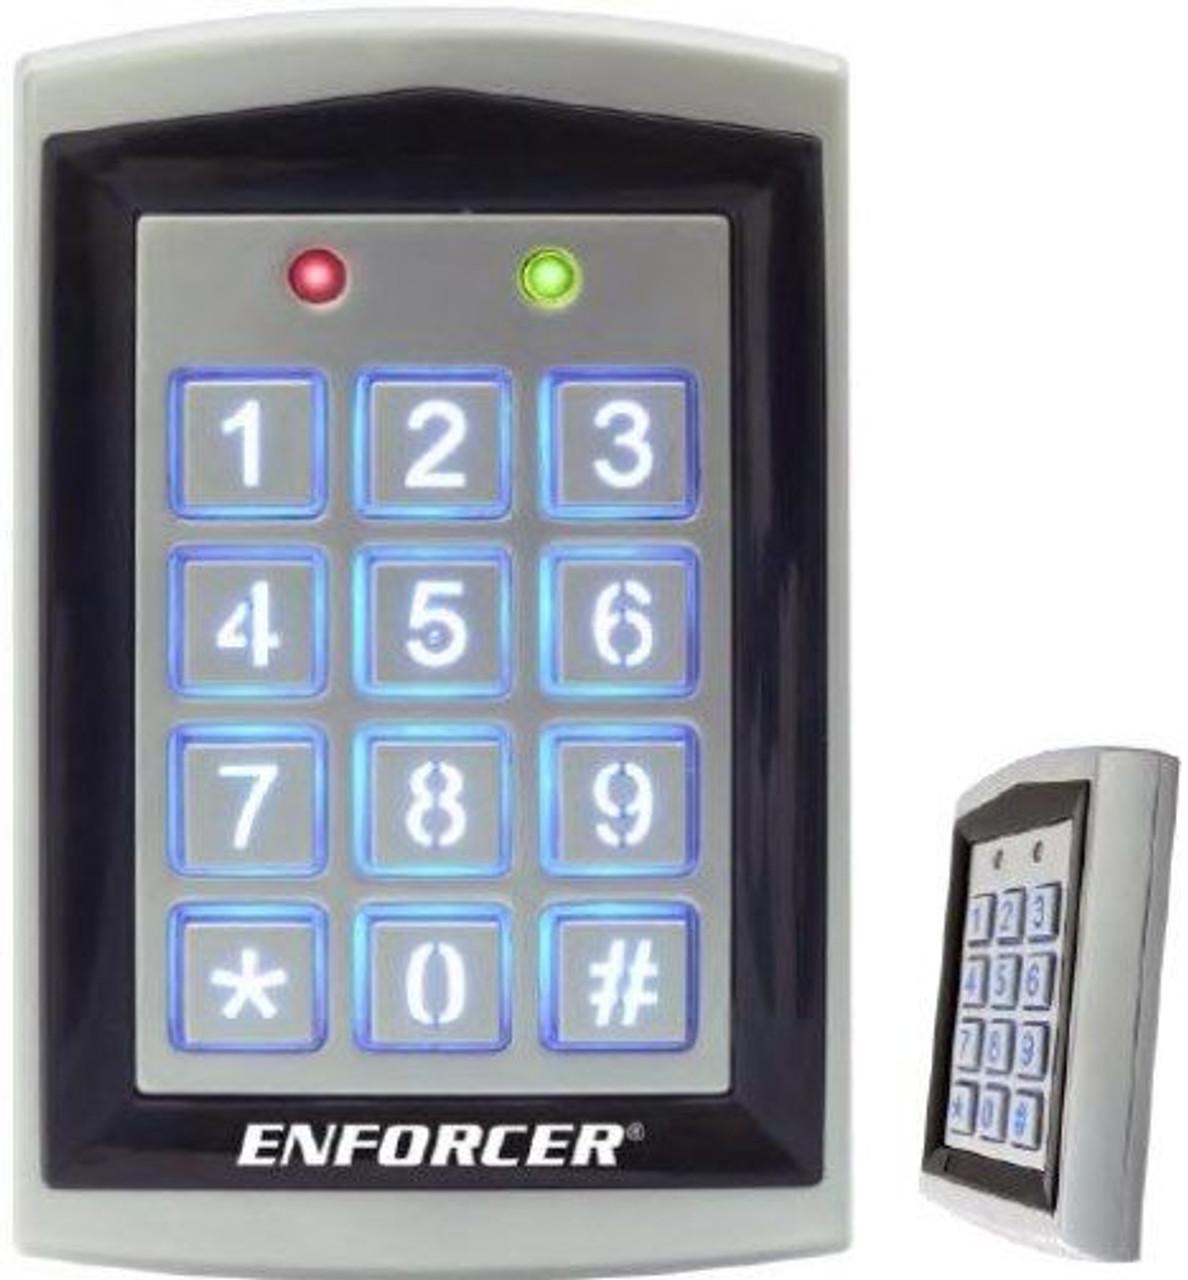 Seco Larm Enforcer Sk 1323 Spq Keypad With Proximity Card